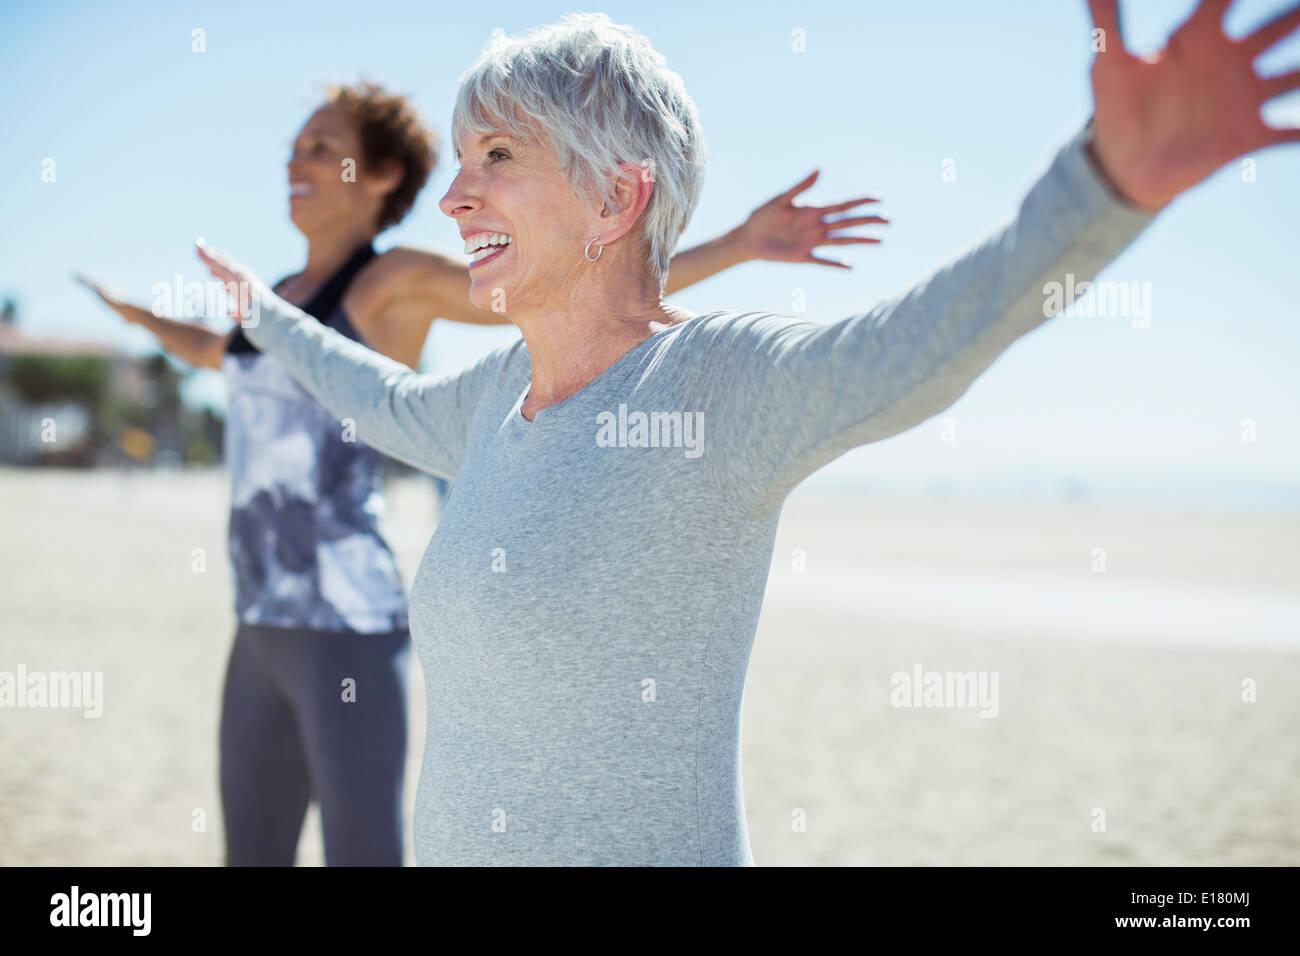 Senior women stretching arms on beach - Stock Image